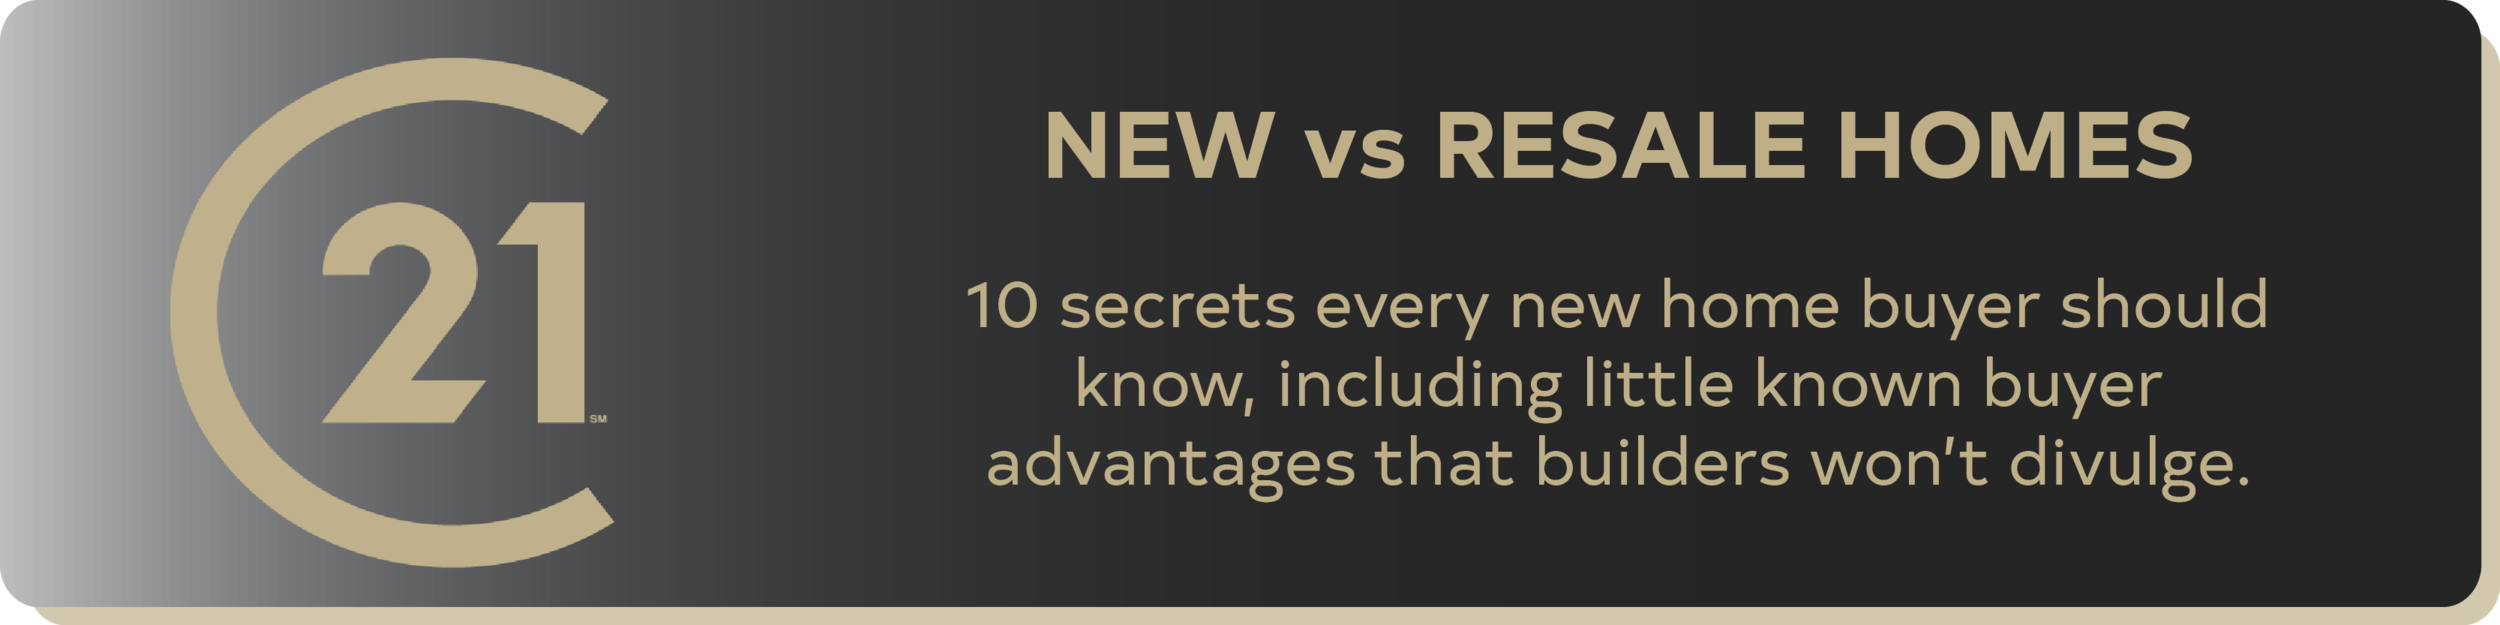 new versus resale homes.png